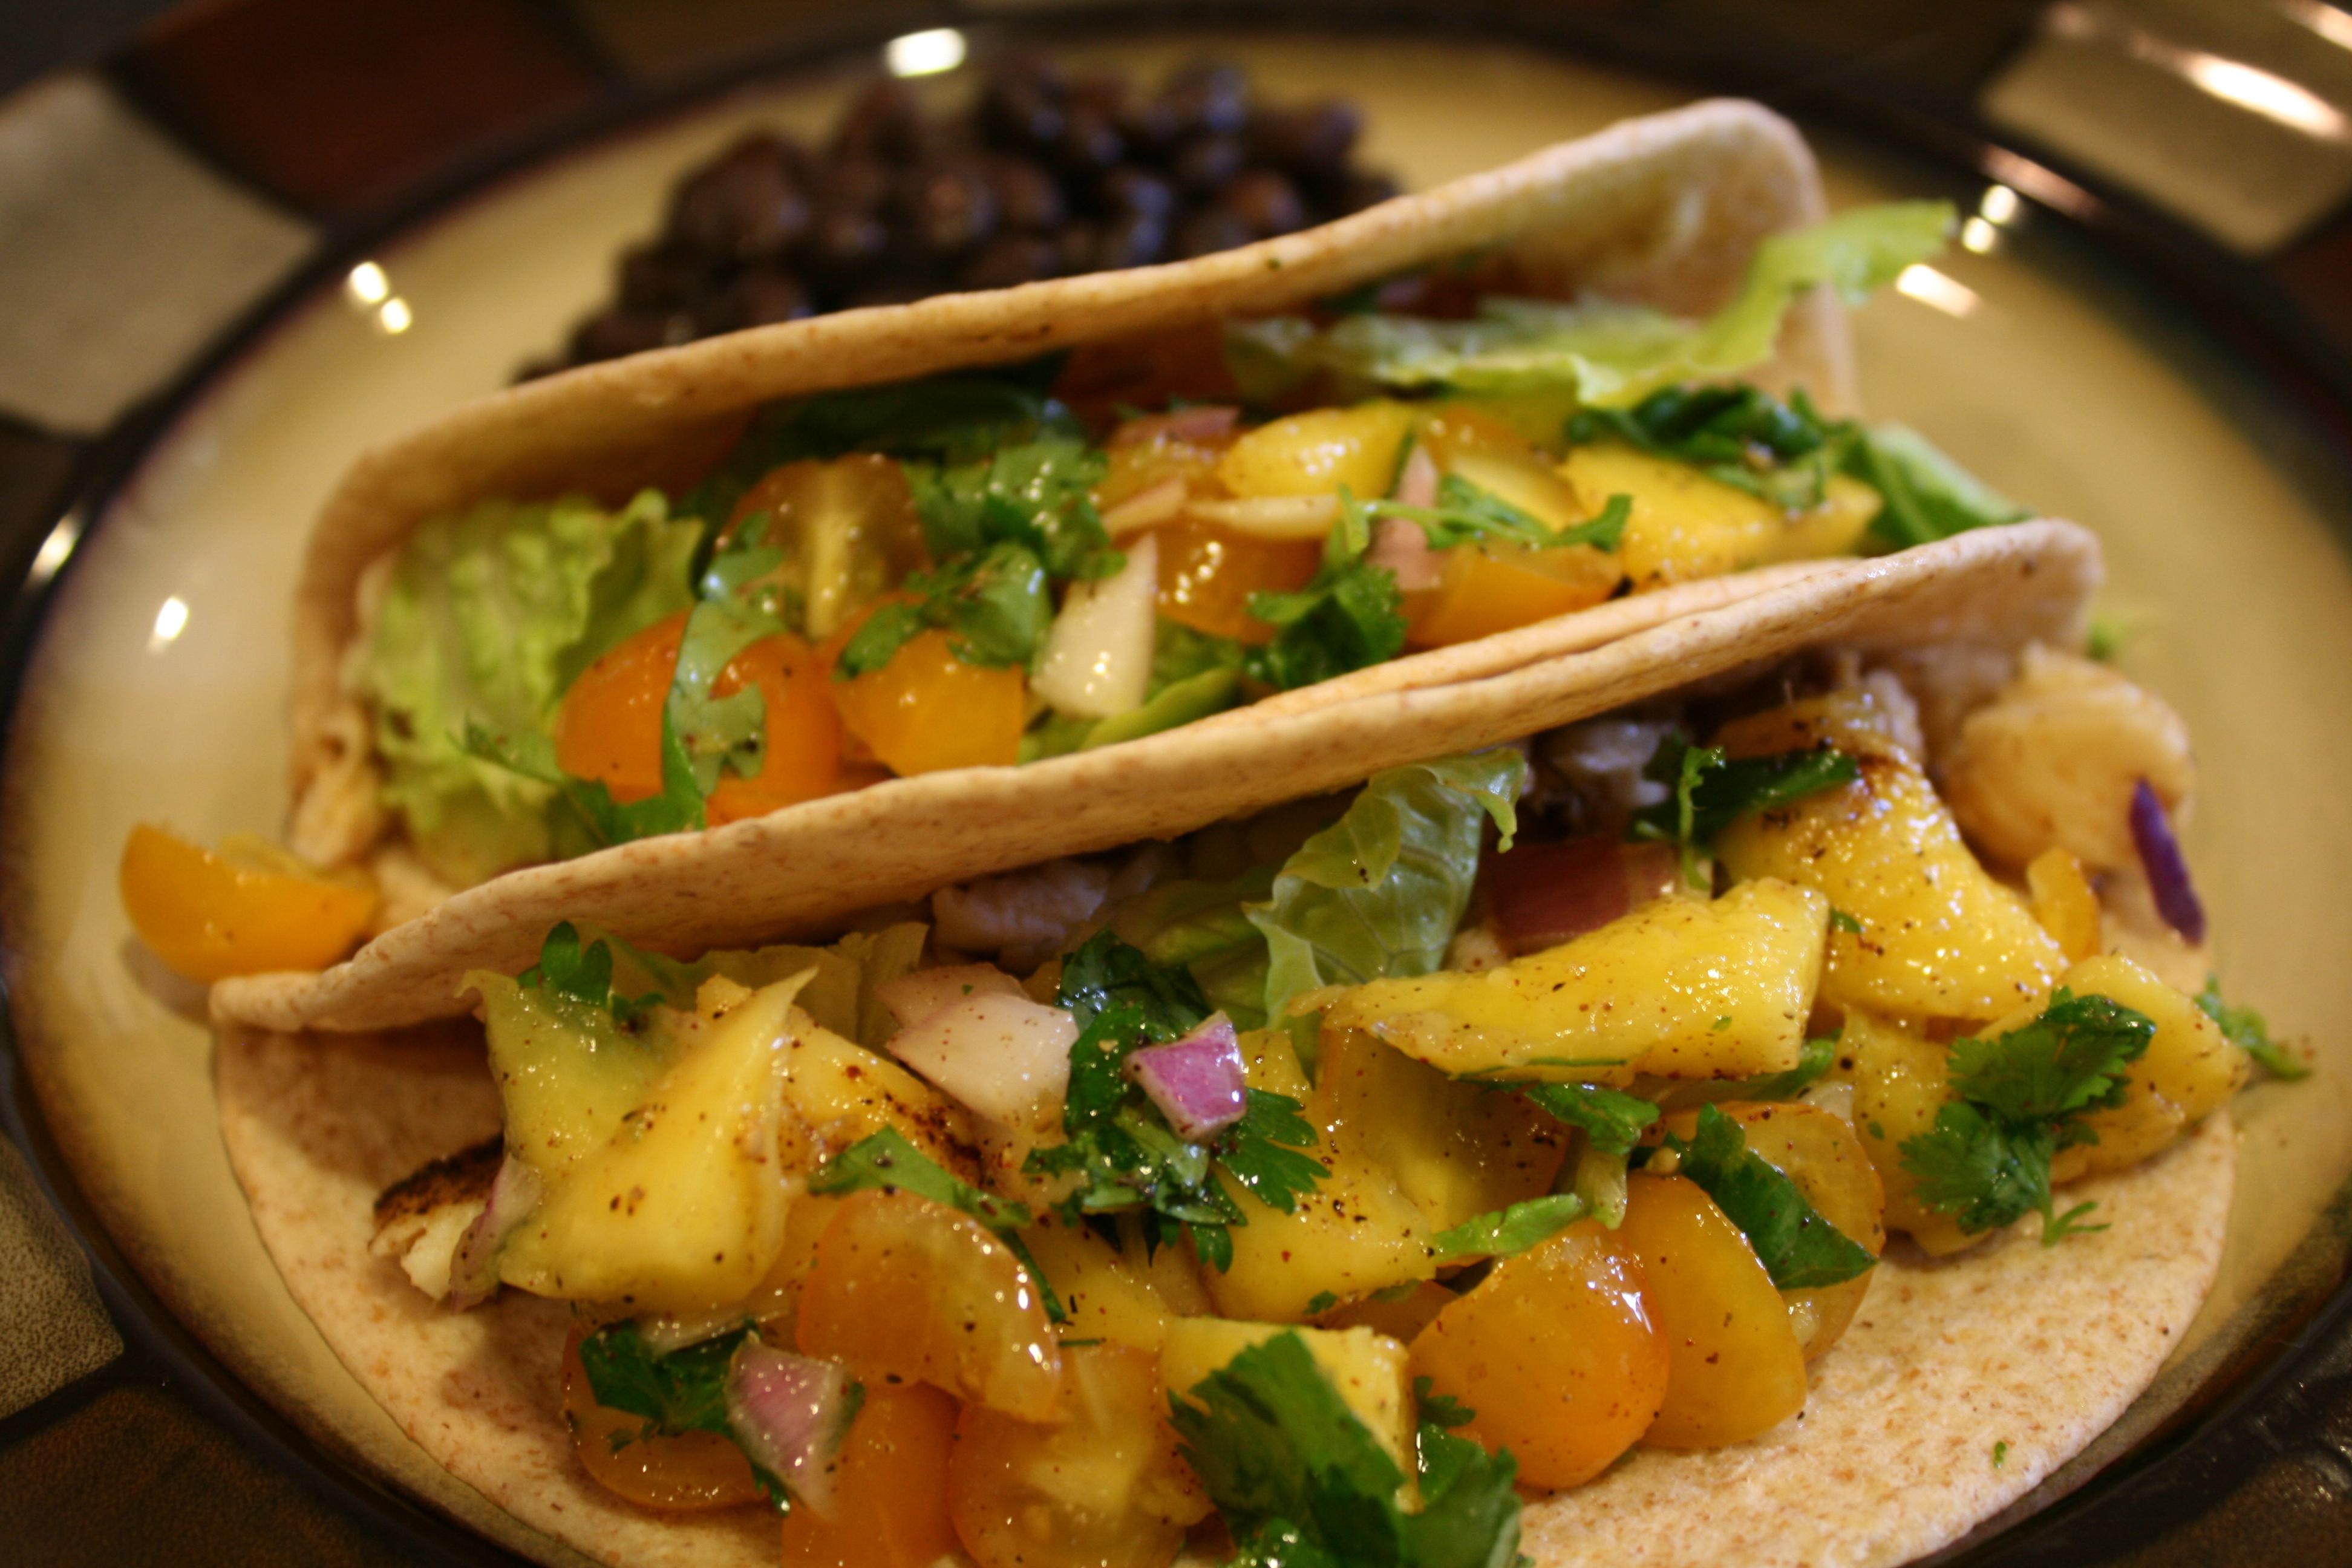 Fish tacos with mango salsa verde for Fish taco salsa